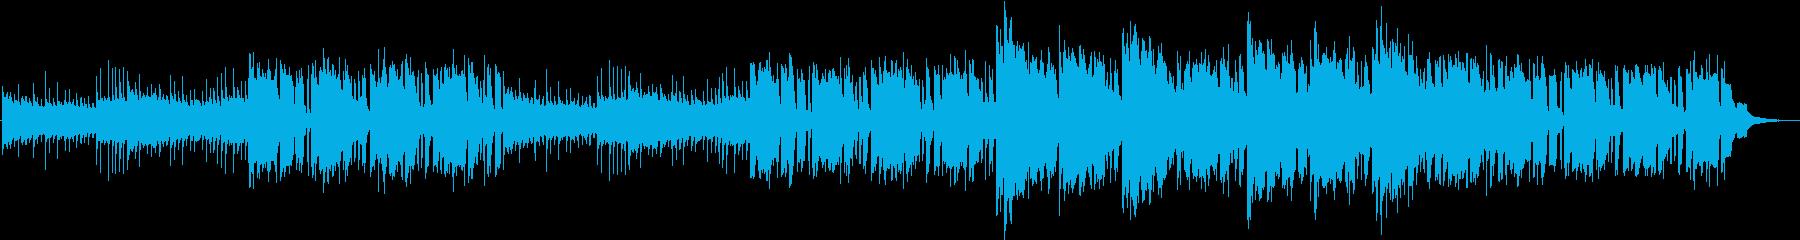 【Epic】サスペンス調、緊張の場面の再生済みの波形